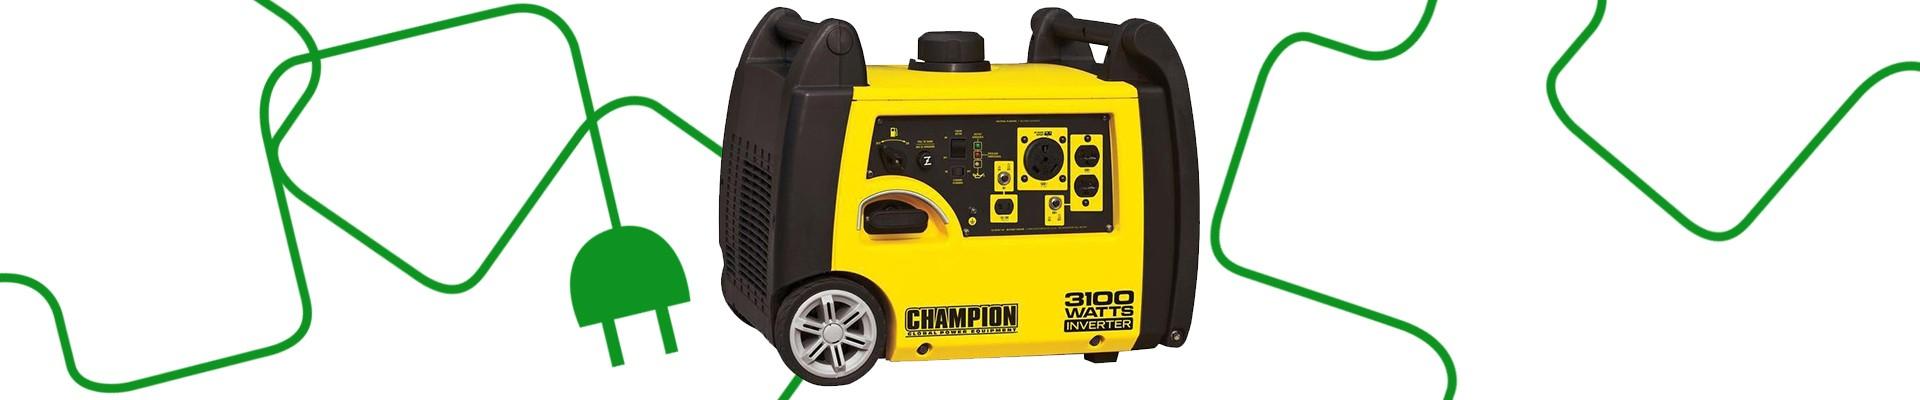 Champion Power RV Generator